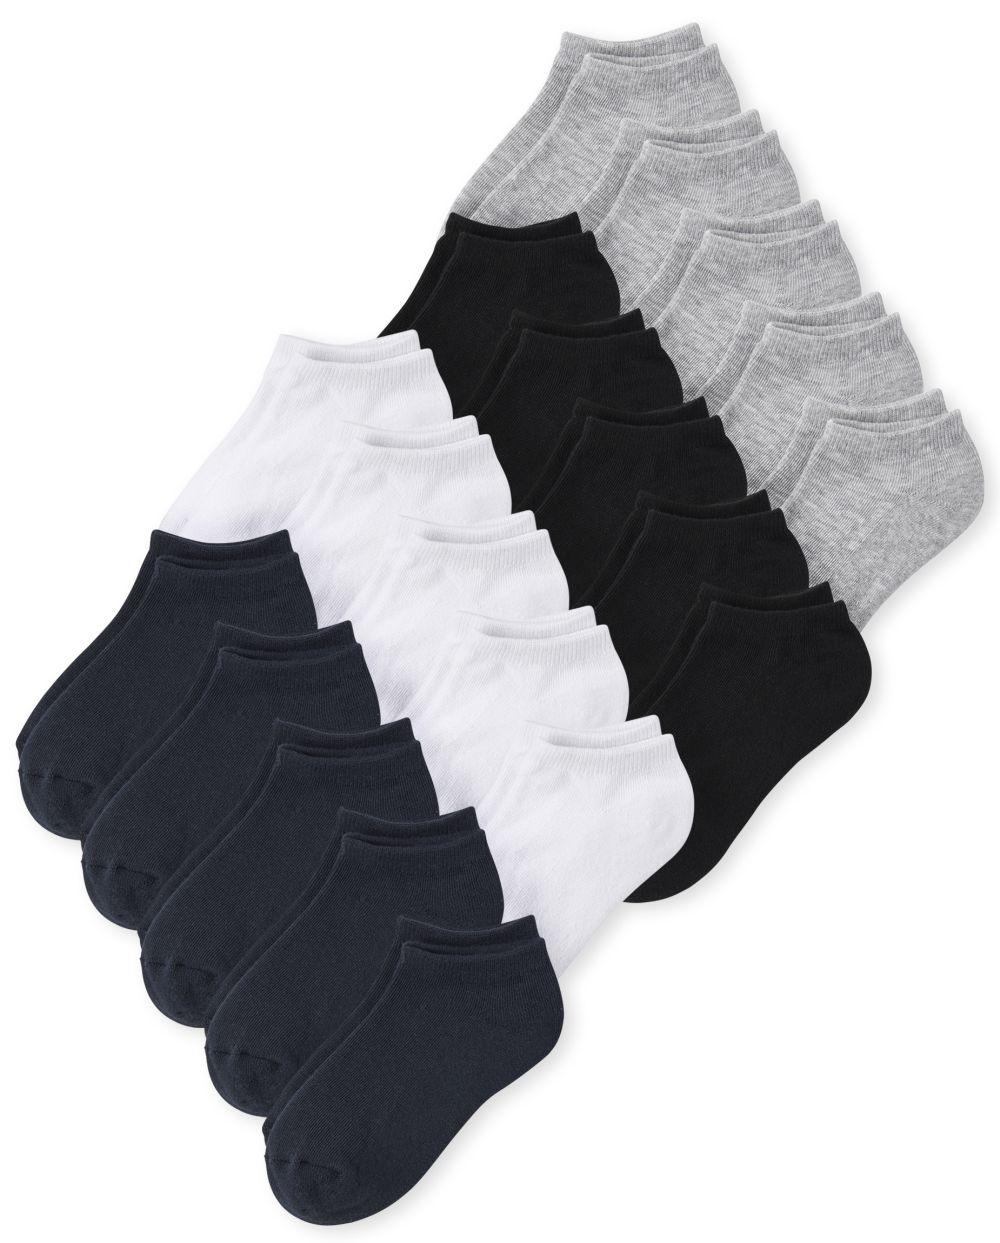 Boys Unisex Kids Ankle Socks 20-Pack - Multi